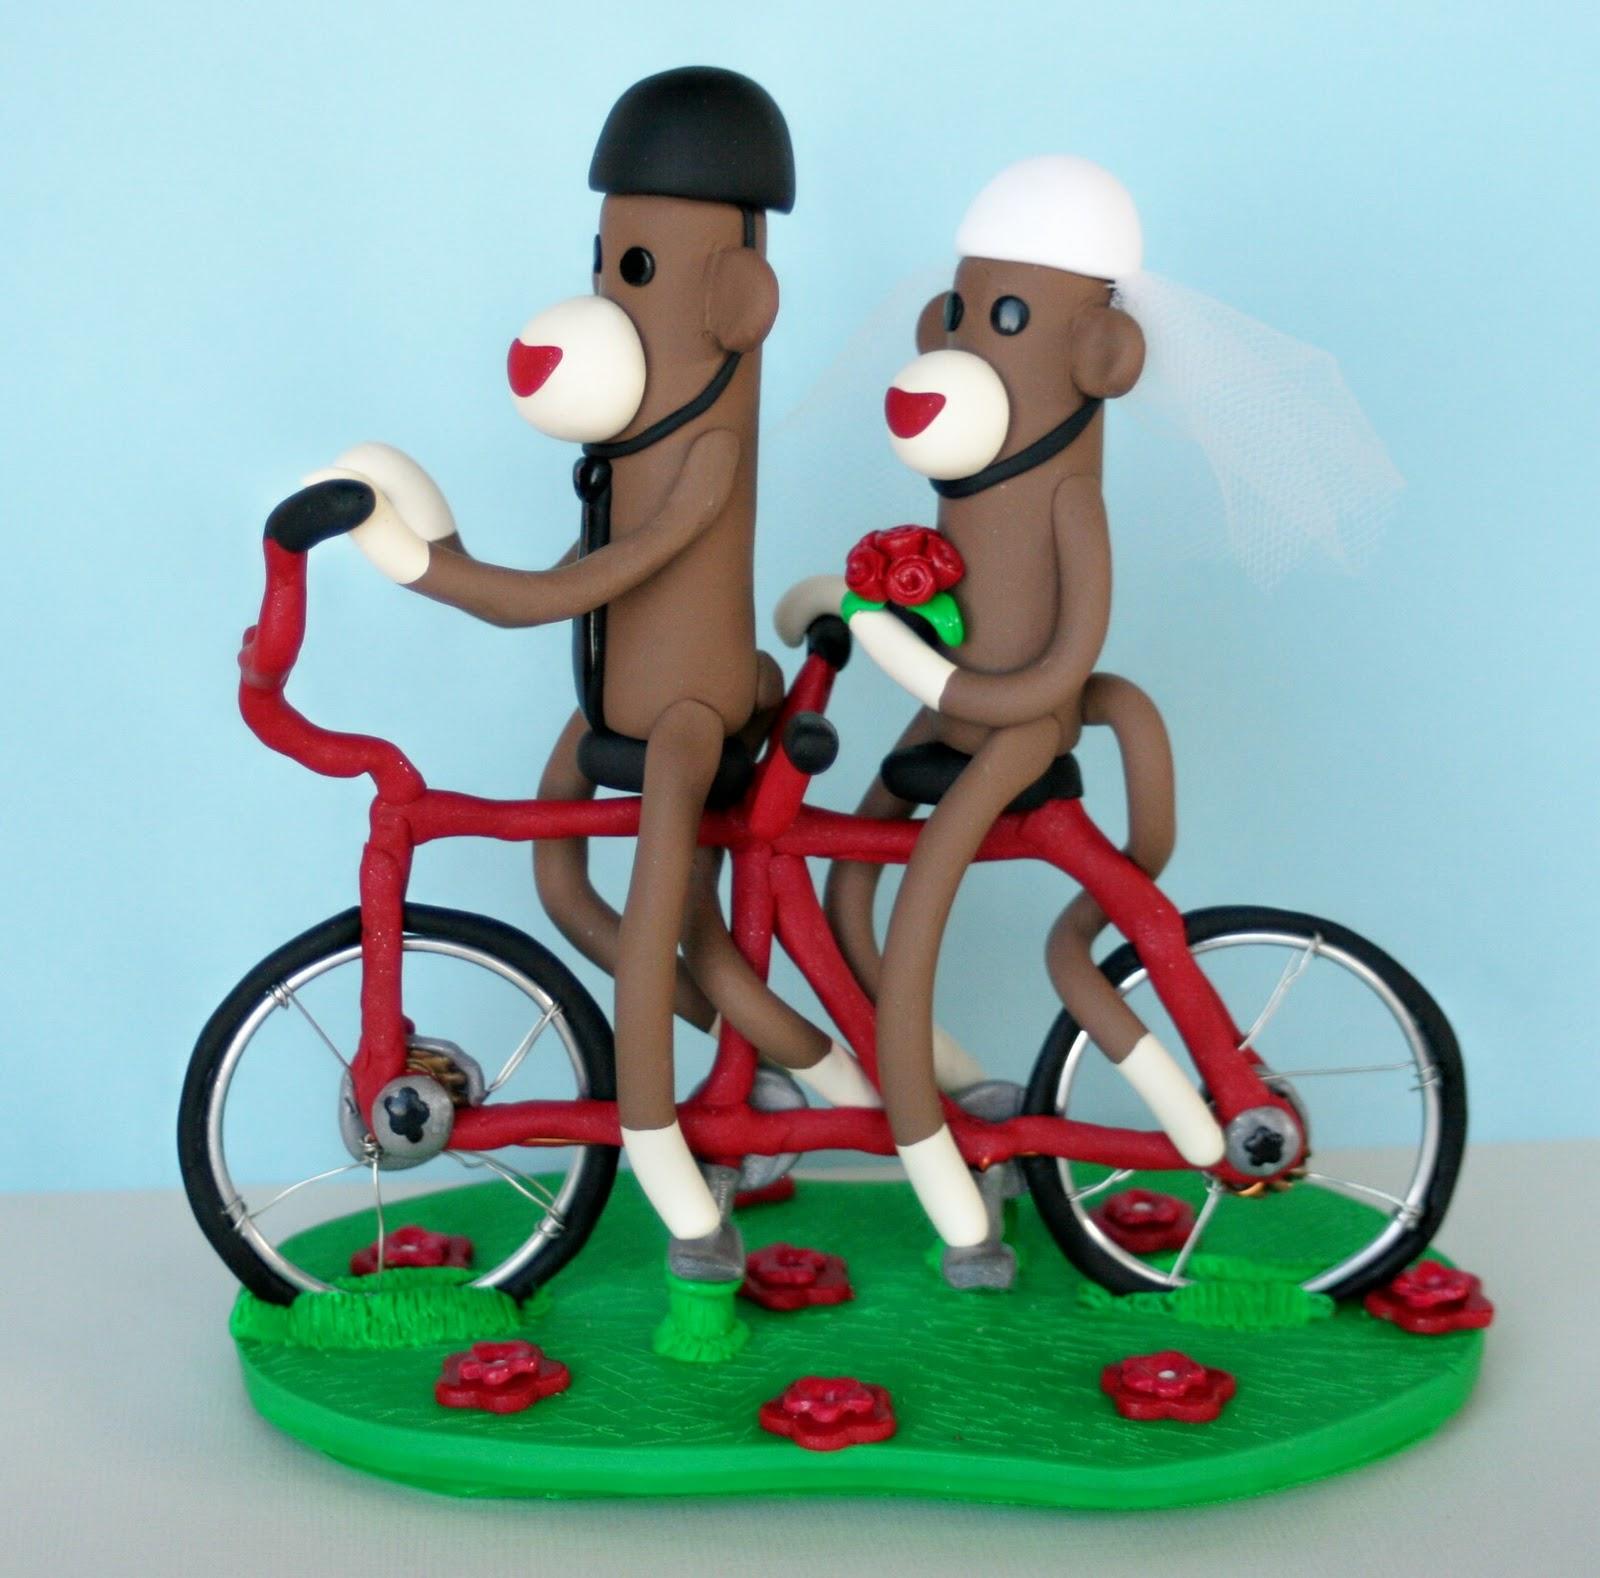 Sock Monkeys On A Tandem Bicycle Wedding Cake Topper